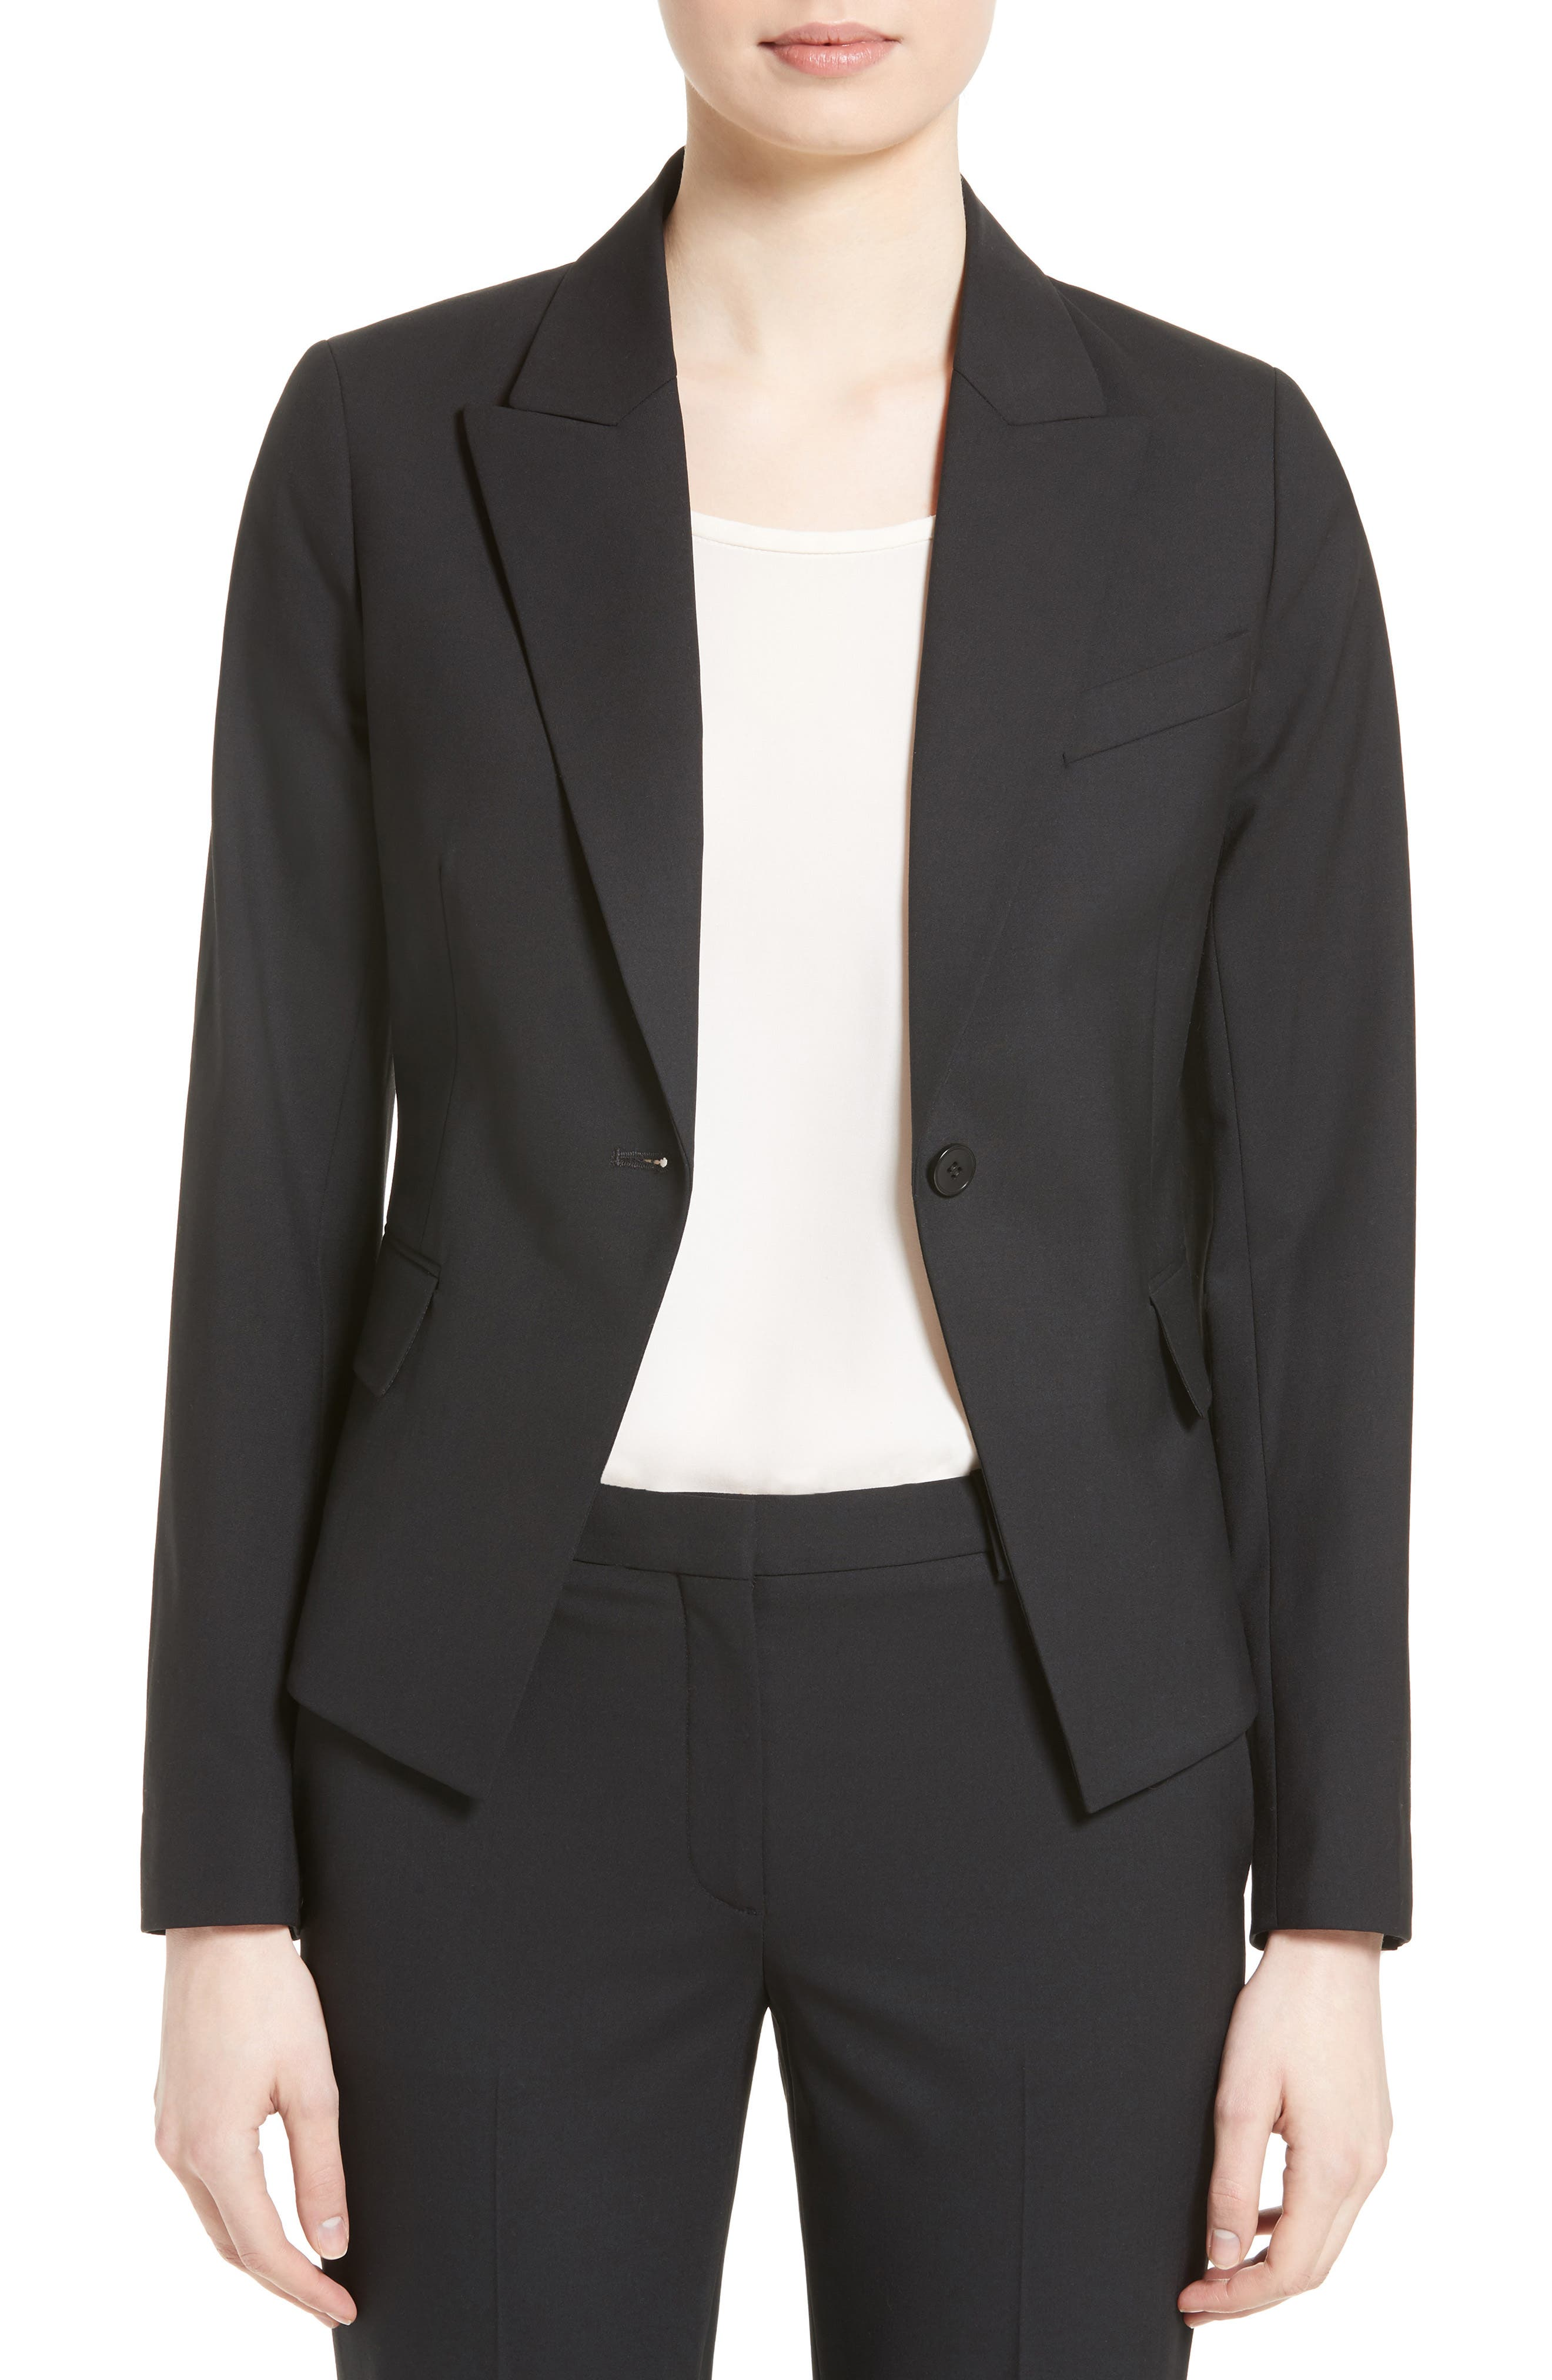 Brince B Good Wool Suit Jacket,                         Main,                         color, BLACK